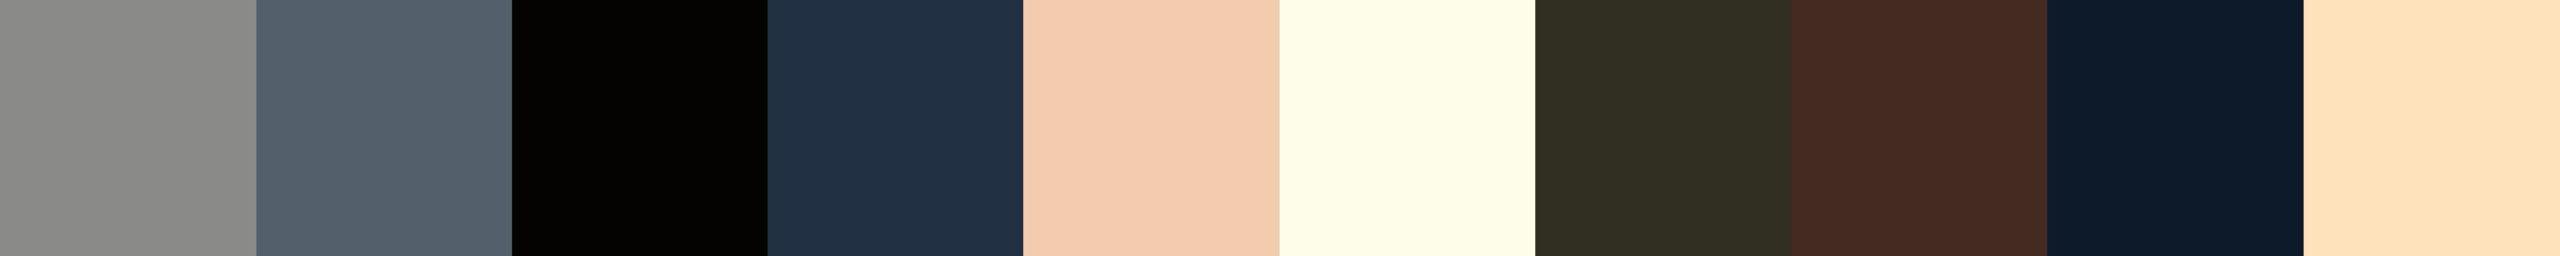 209 Neropadia Color Palette